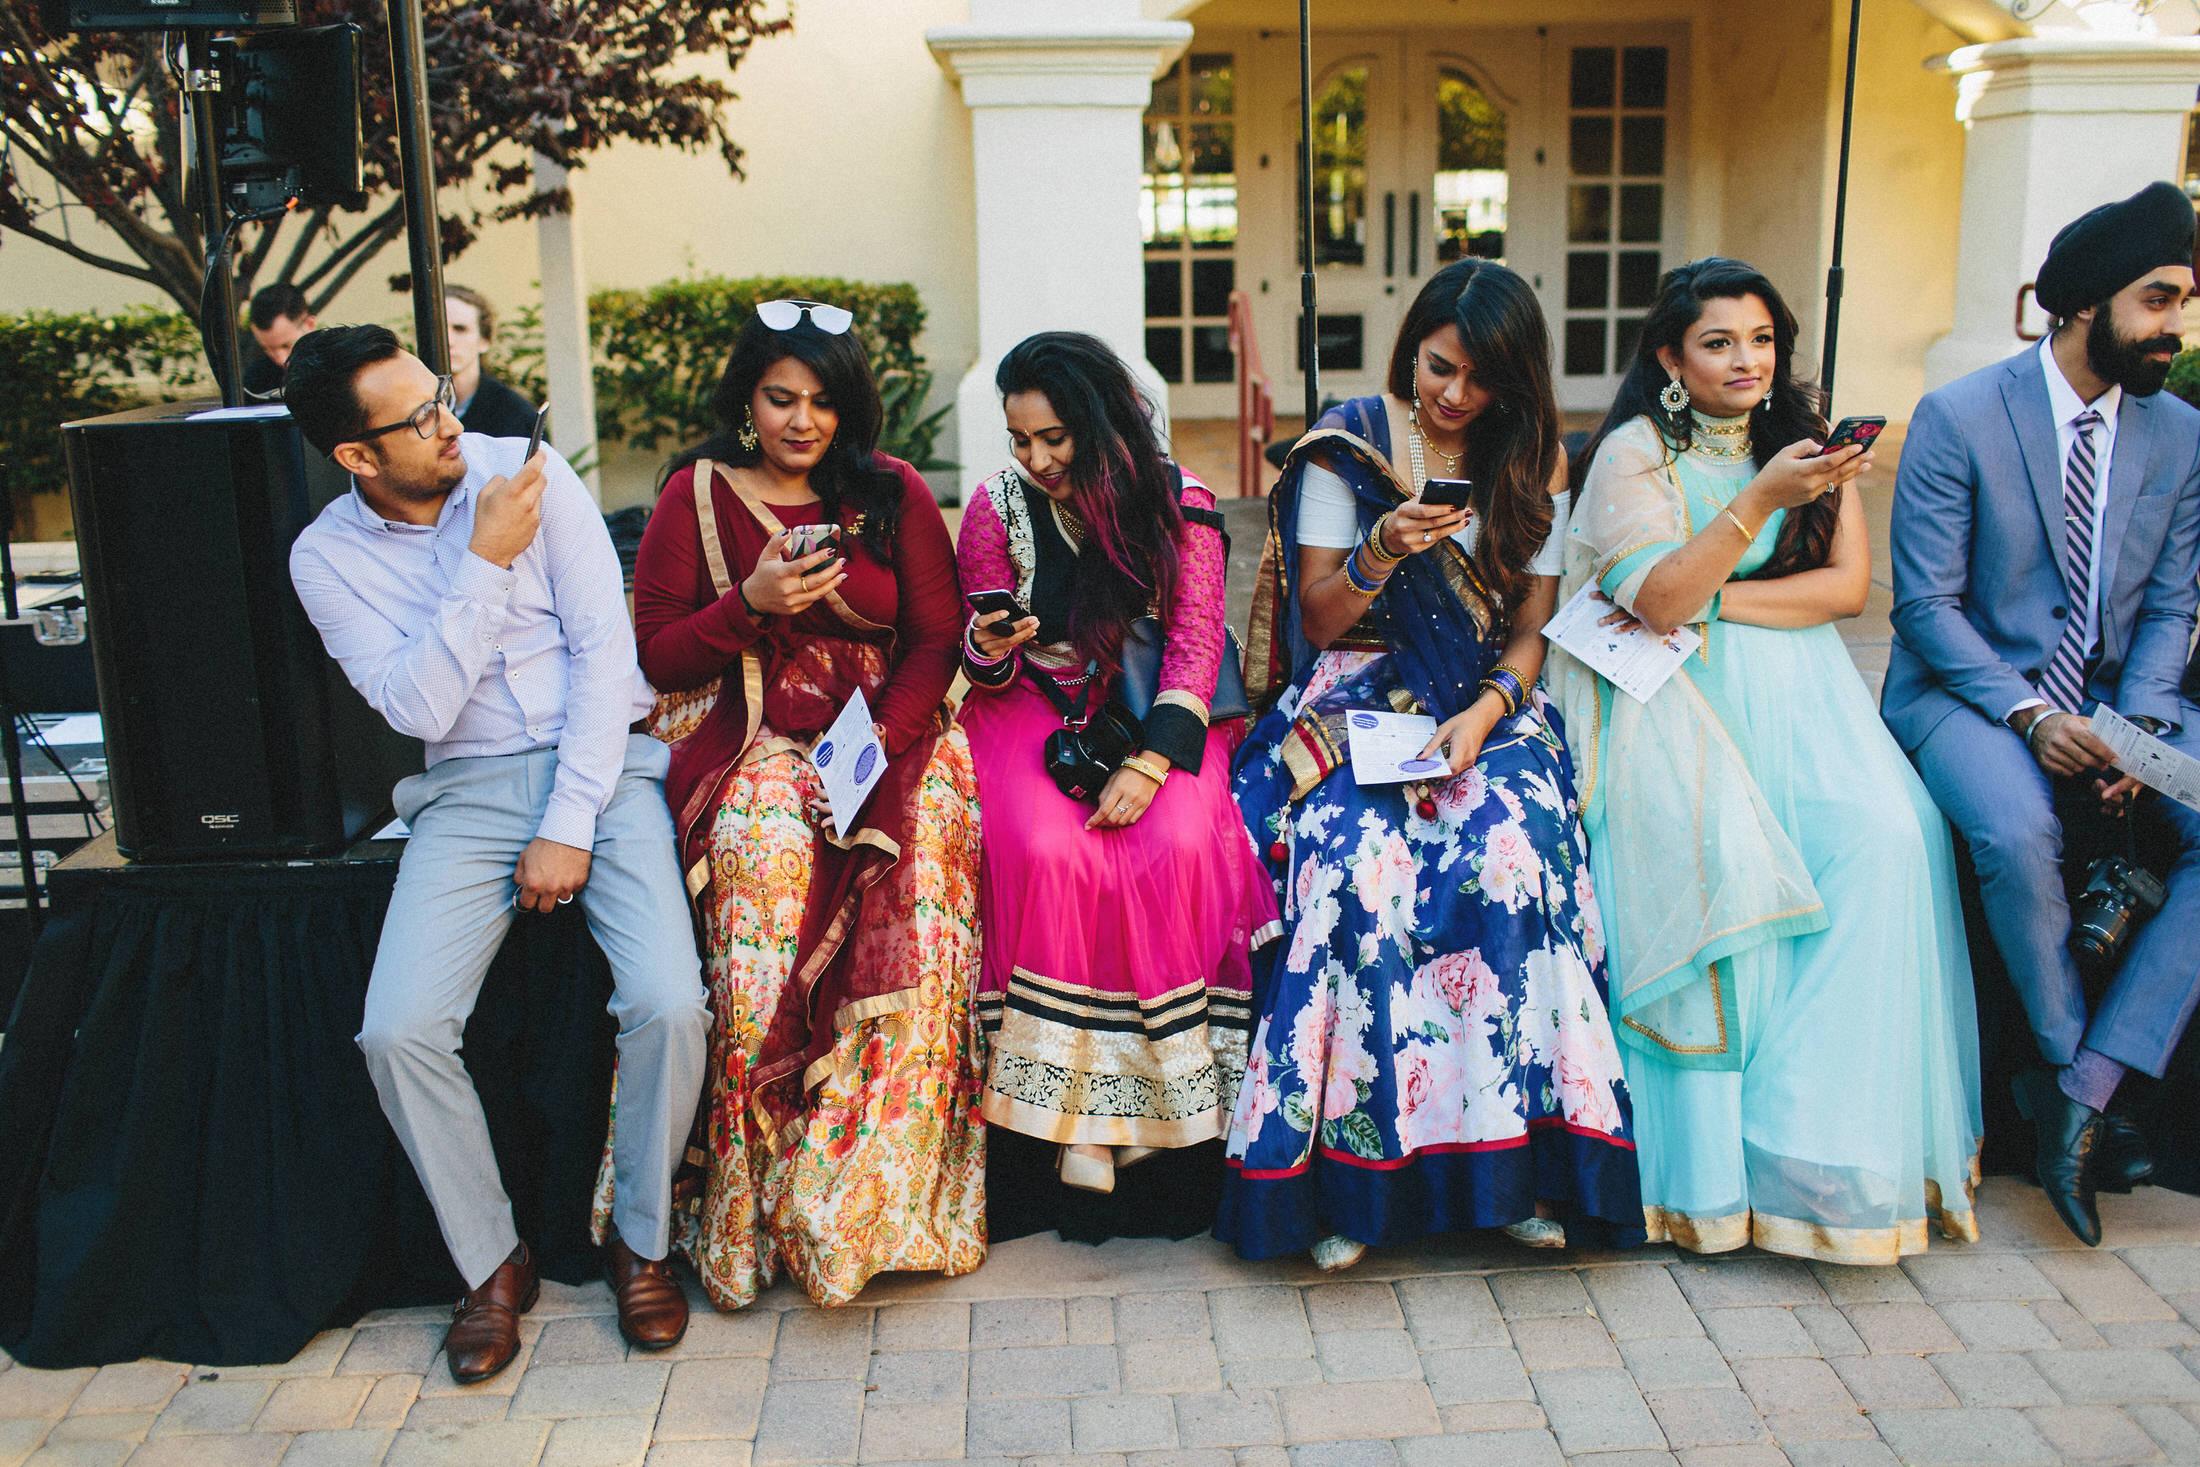 Modern-Indian-Serra-Plaza-wedding-065.jpg